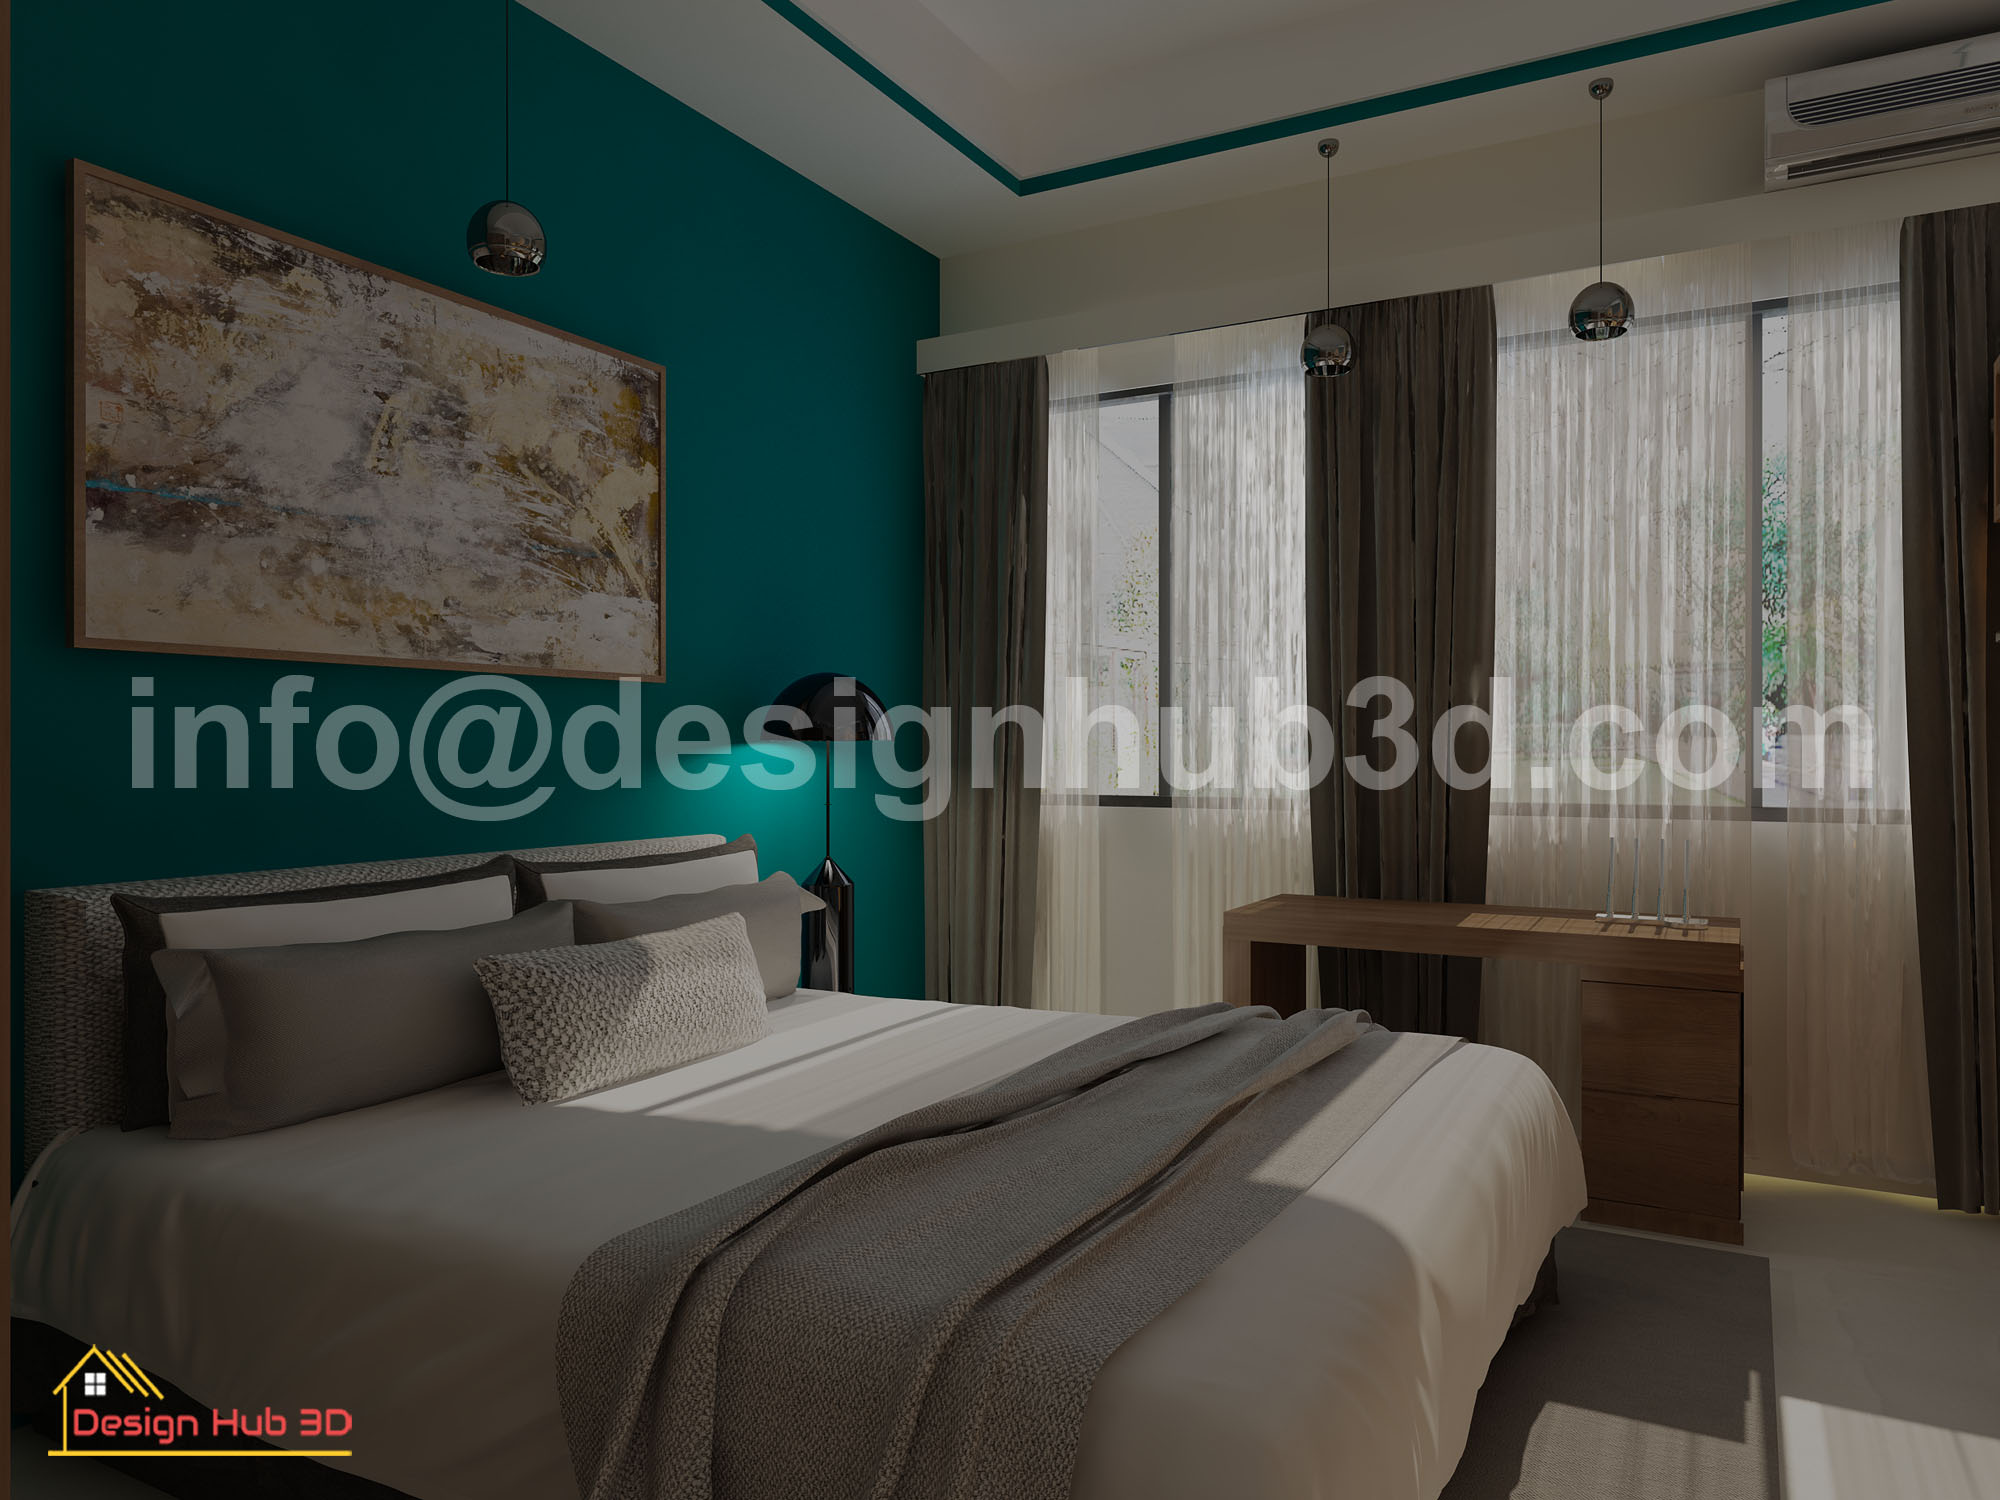 Designhub3d-home decor, master bed, interior design